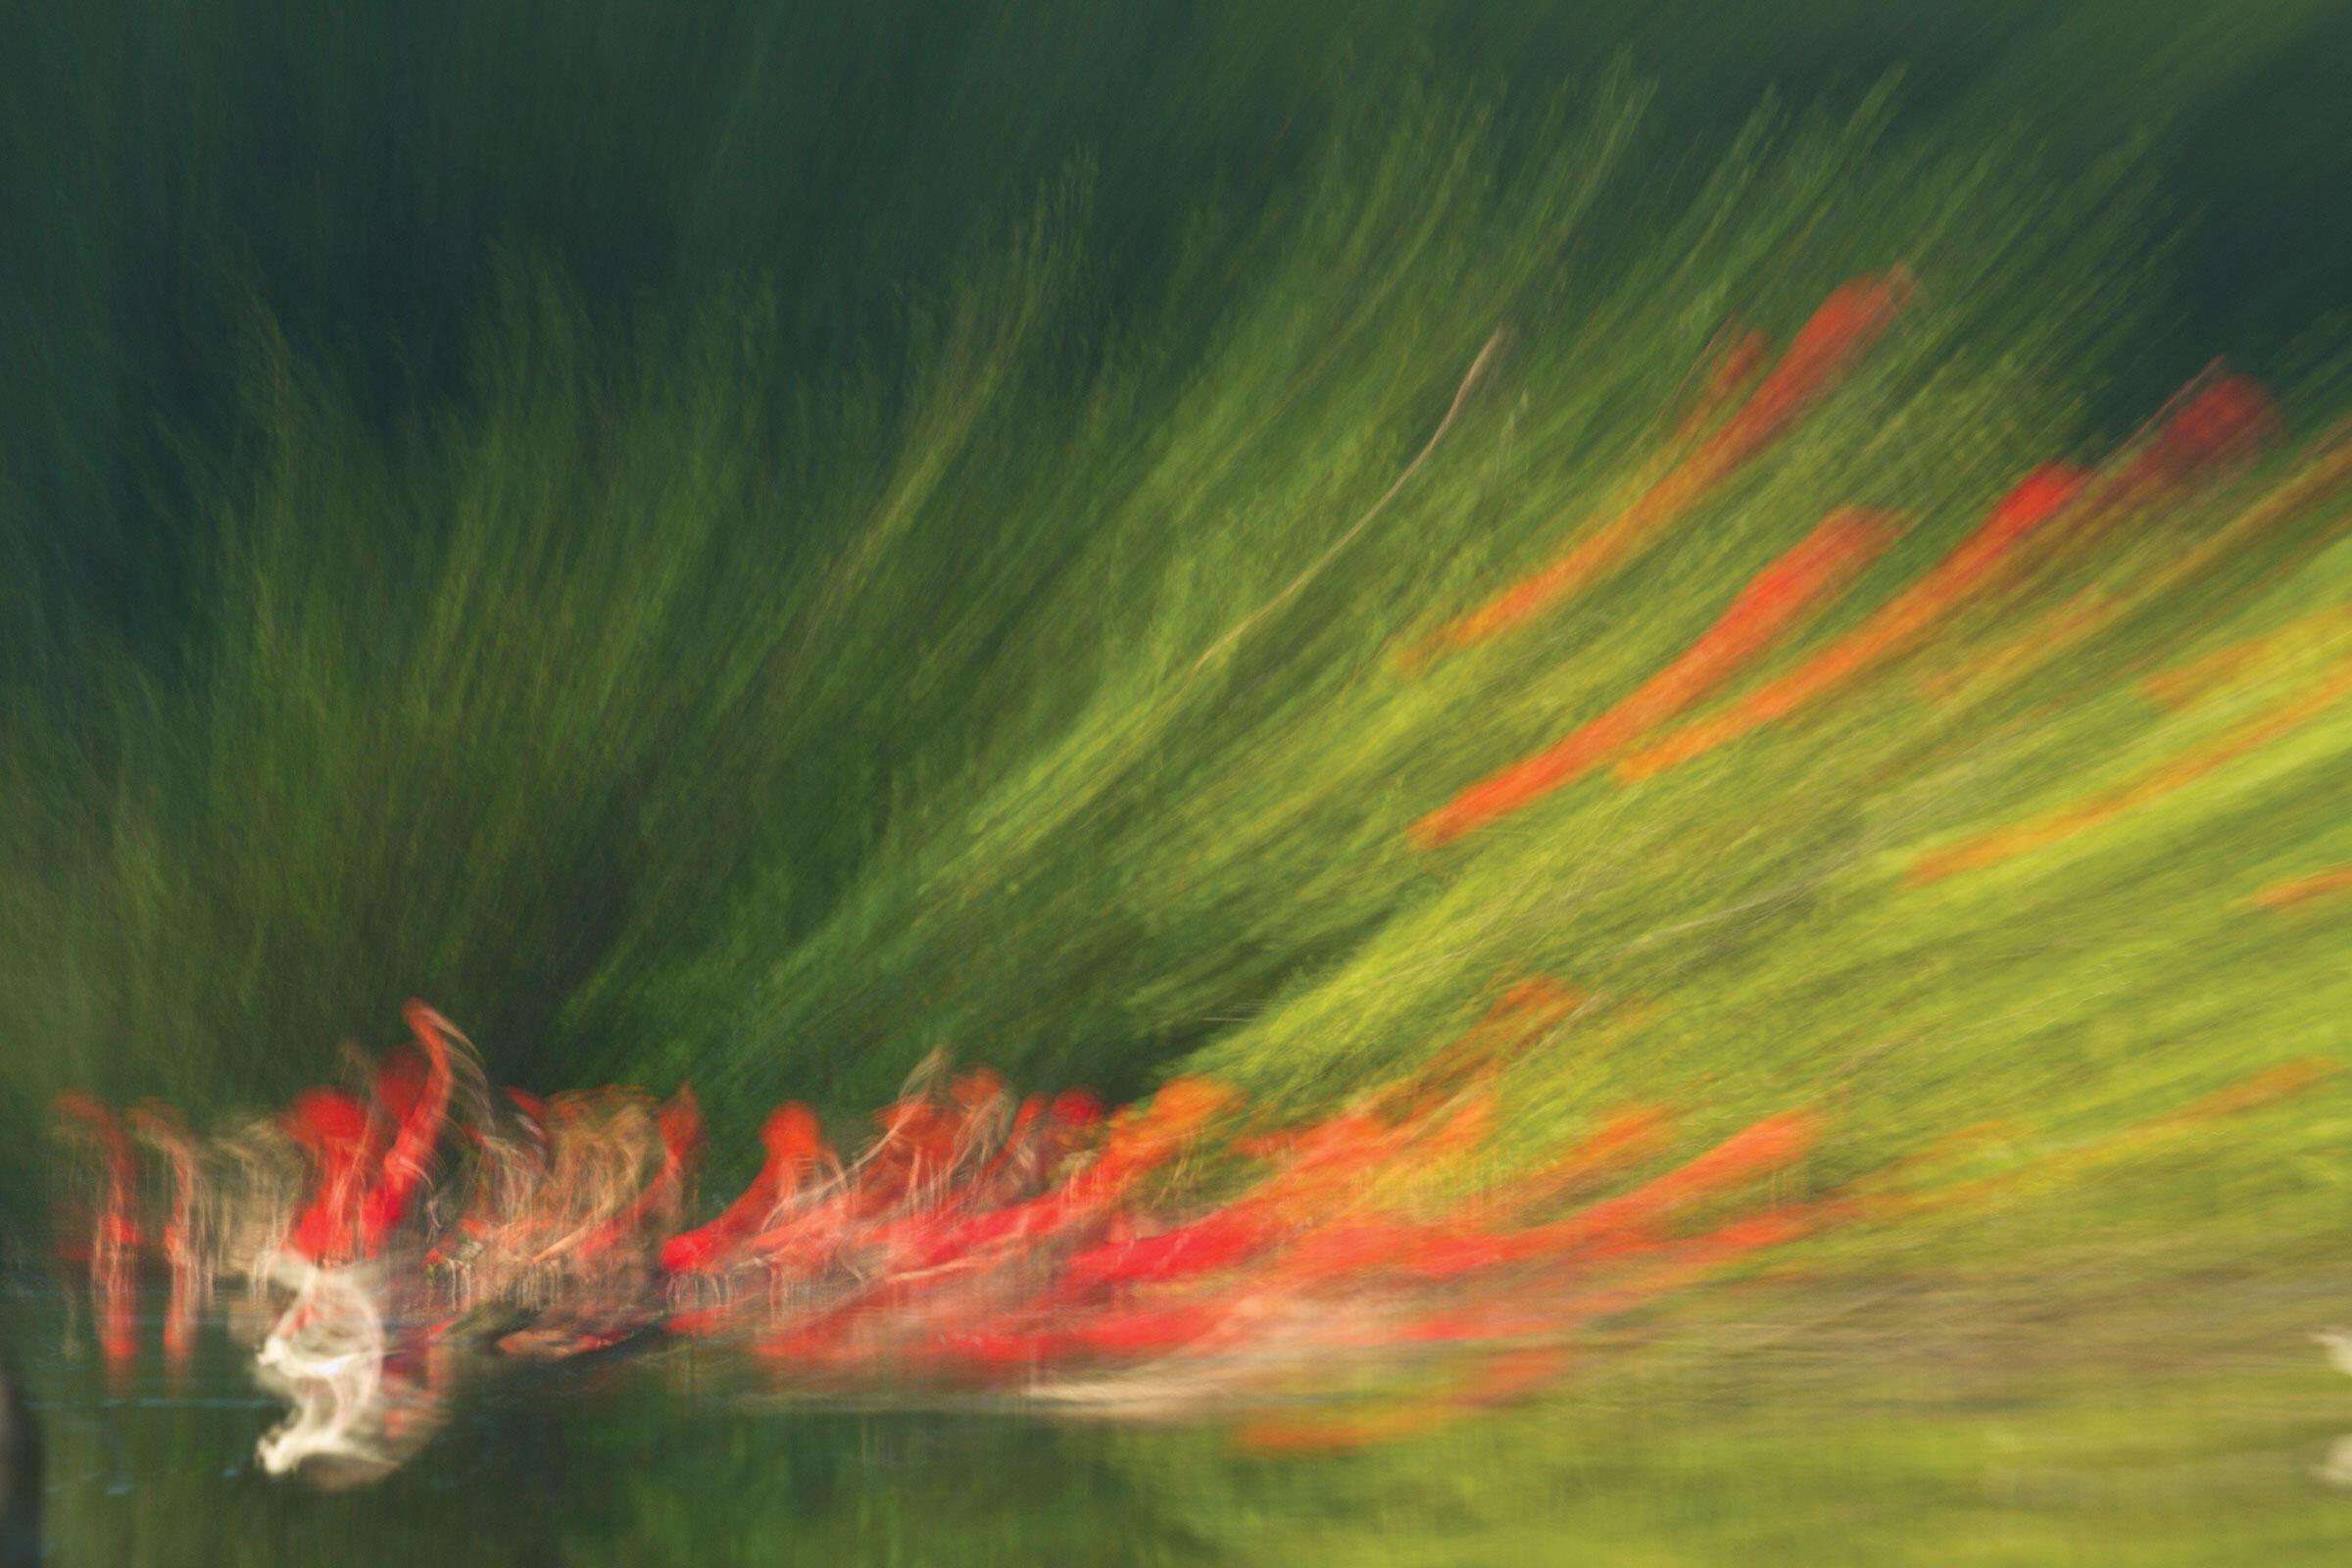 Scarlet Ibises and Snowy Egret, using zoom blur. Faraaz Abdool